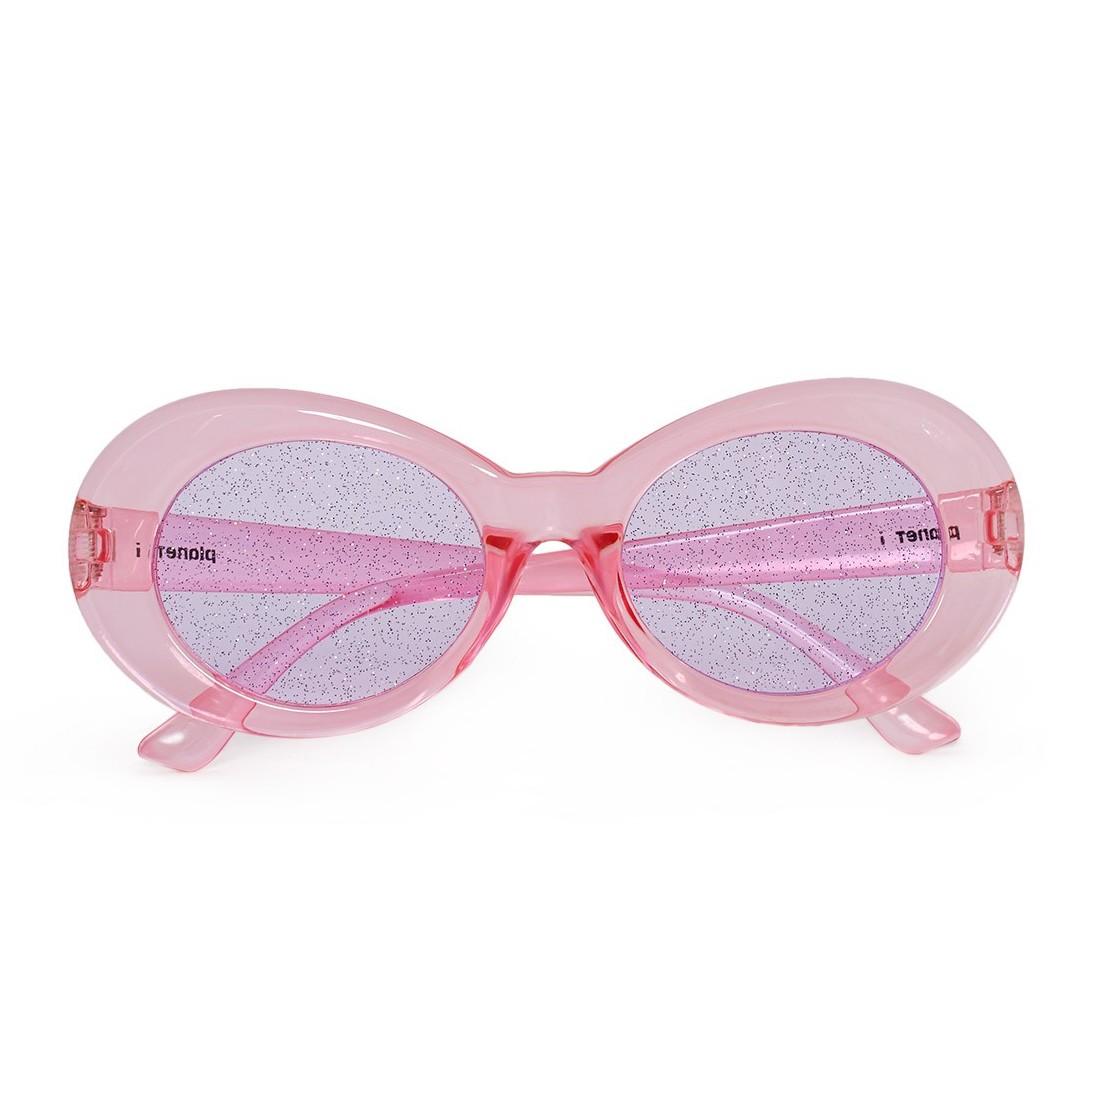 Glitter Glasses Designed By Planet i Are The Latest Must Have Sparkle Item Eyewear Glasses Glitter Instagram Buy Shop Online